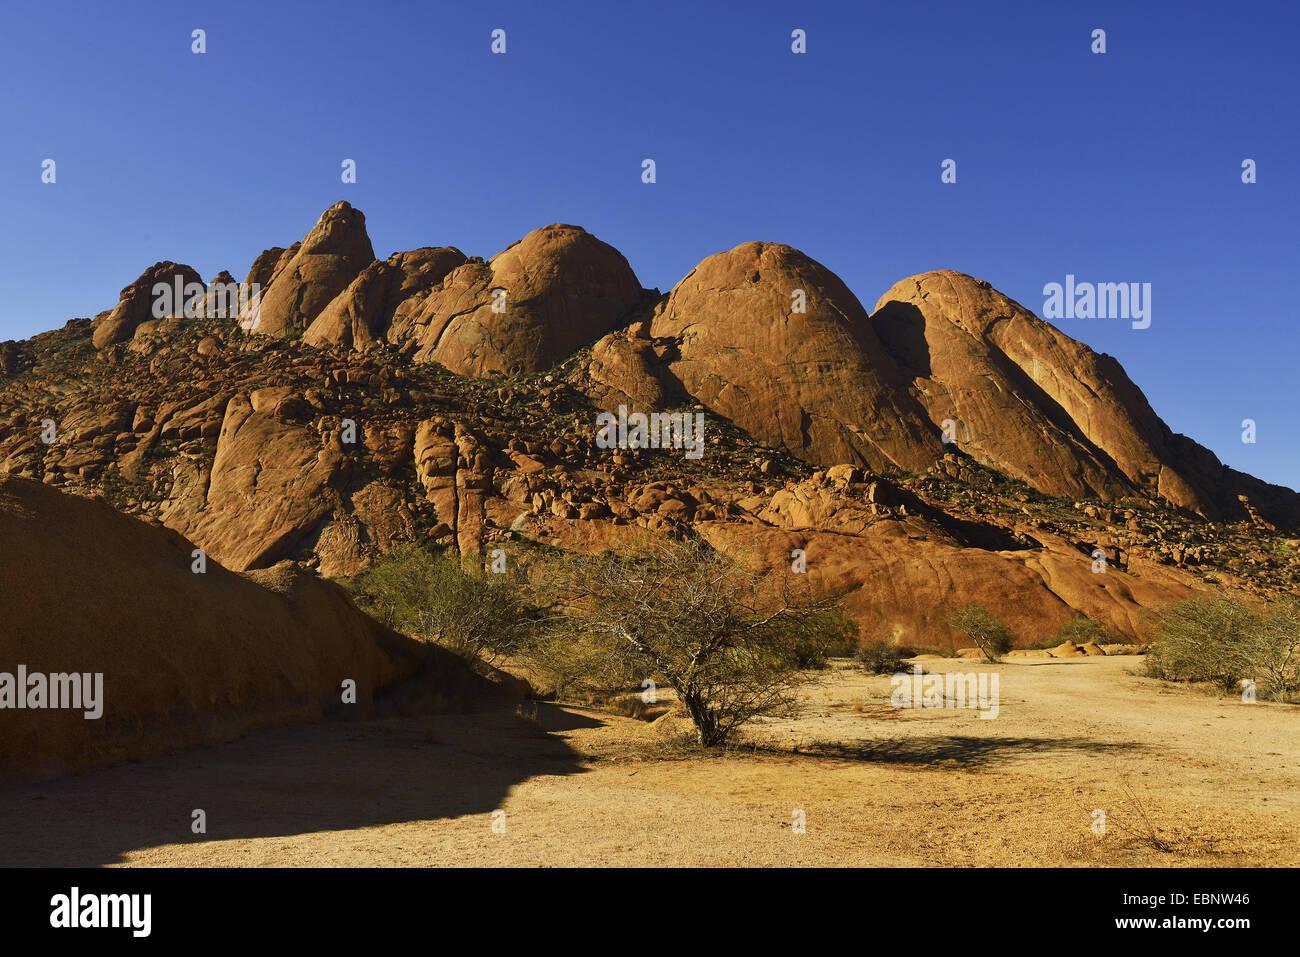 Spitzkoppe mountain near Windhoek, Namibia, Swakopmund - Stock Image